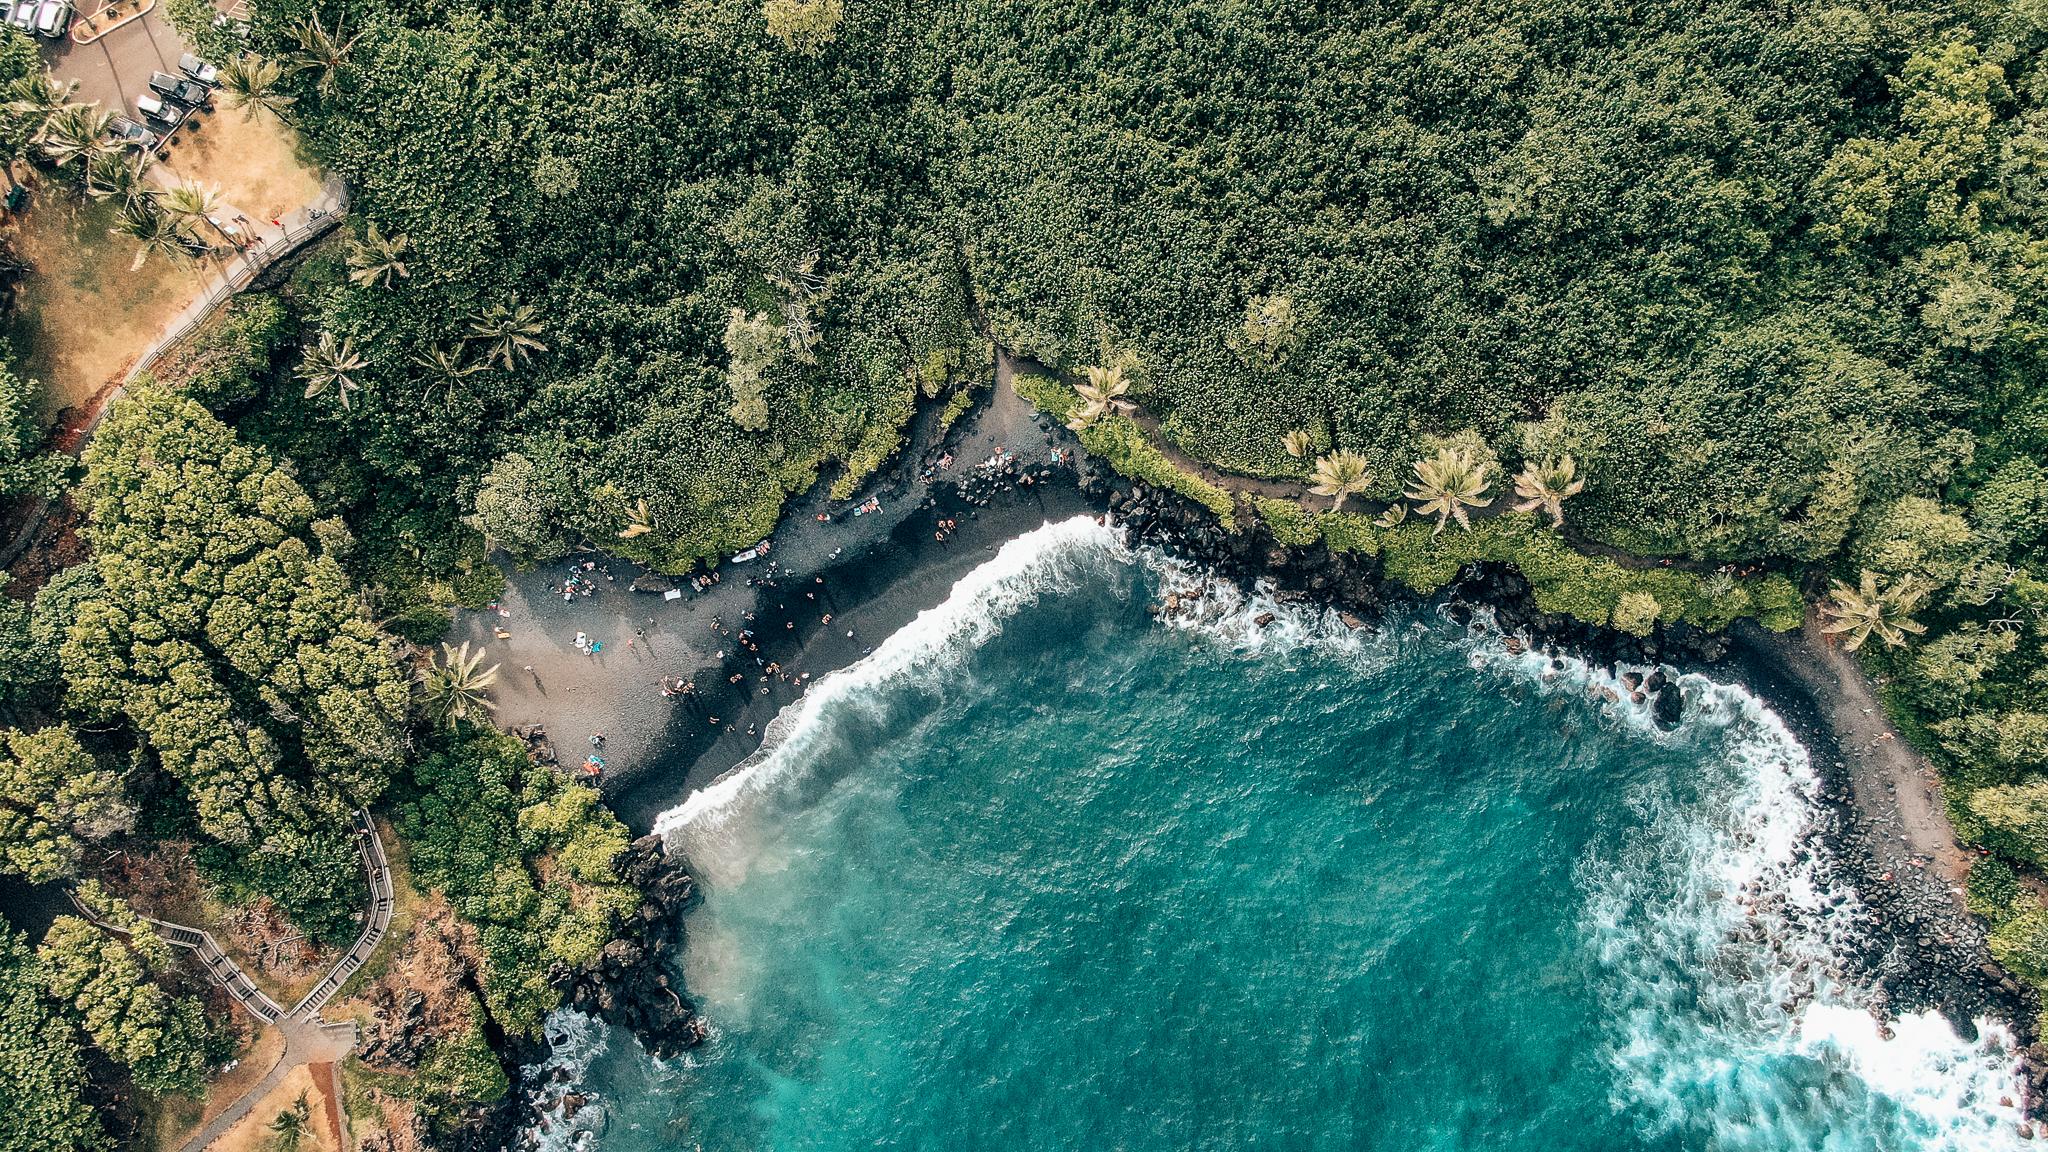 Honokalani Black Sand Beach from above - Wai'anapanapa State Park